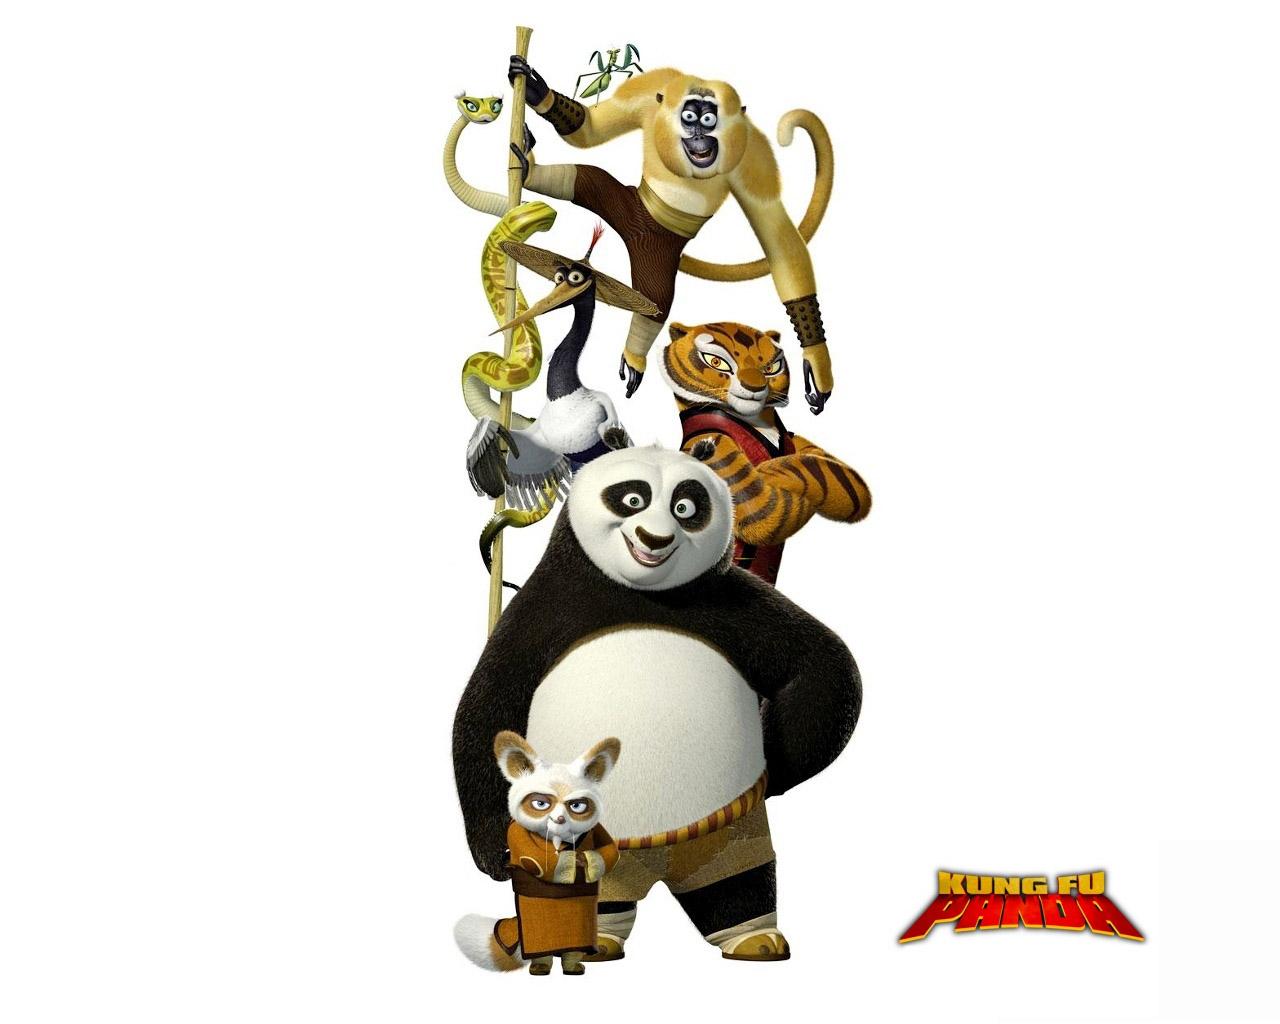 Free Download High Quality Kung Fu Panda Wallpaper Num 31